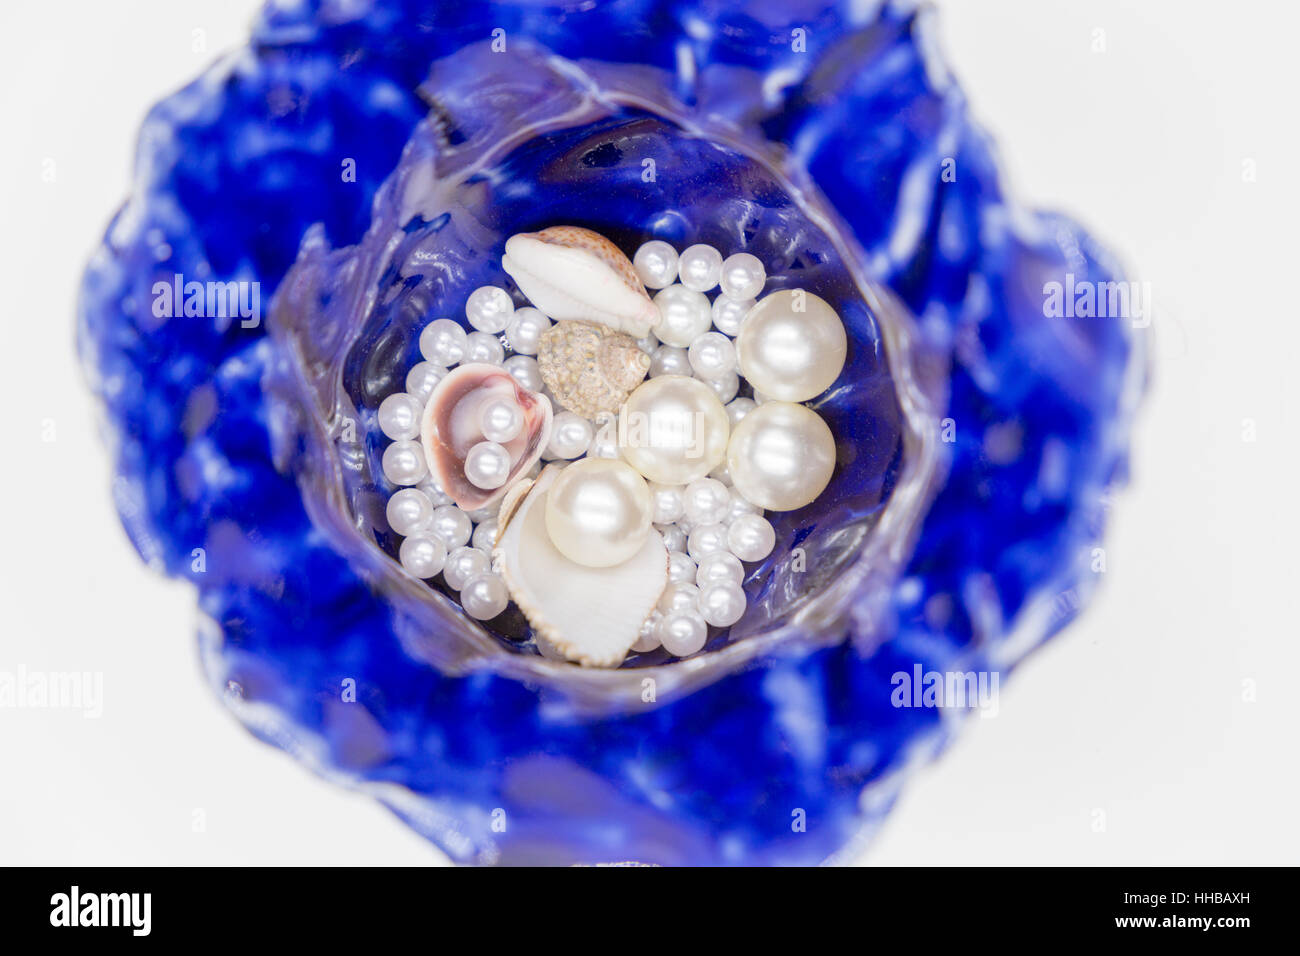 Blue pottery - Stock Image